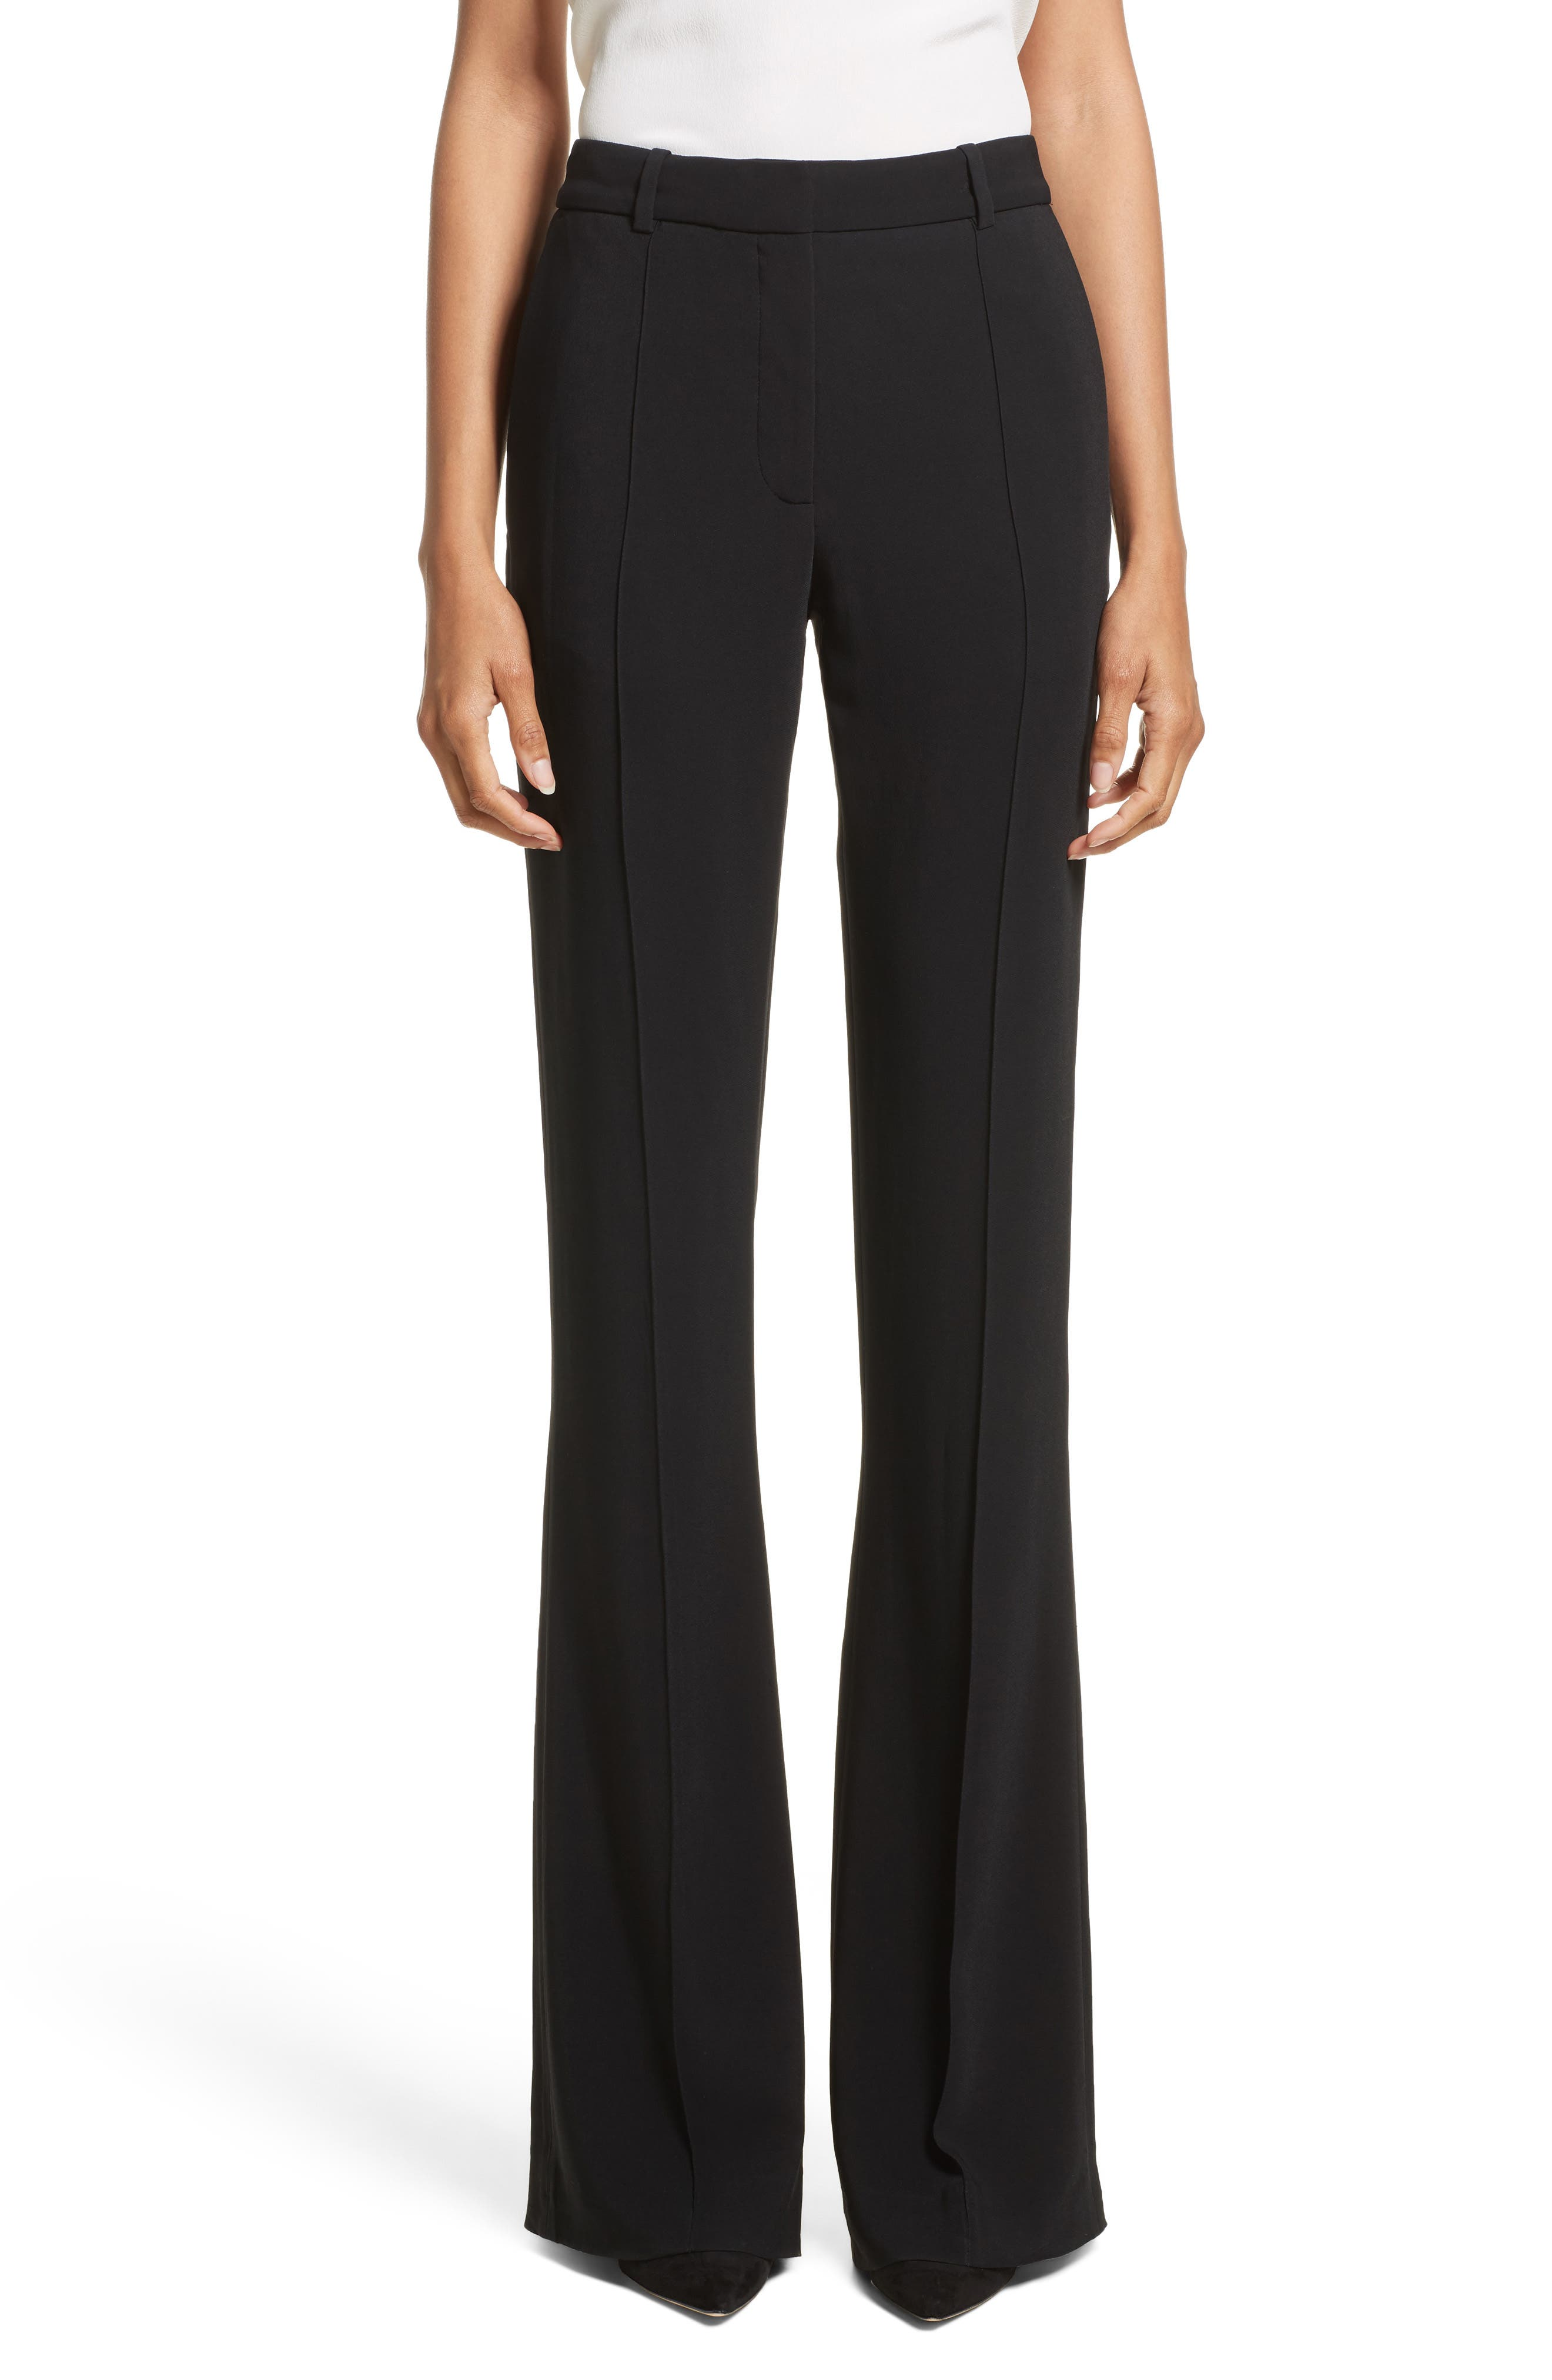 Alternate Image 1 Selected - Victoria Beckham Flare Pants